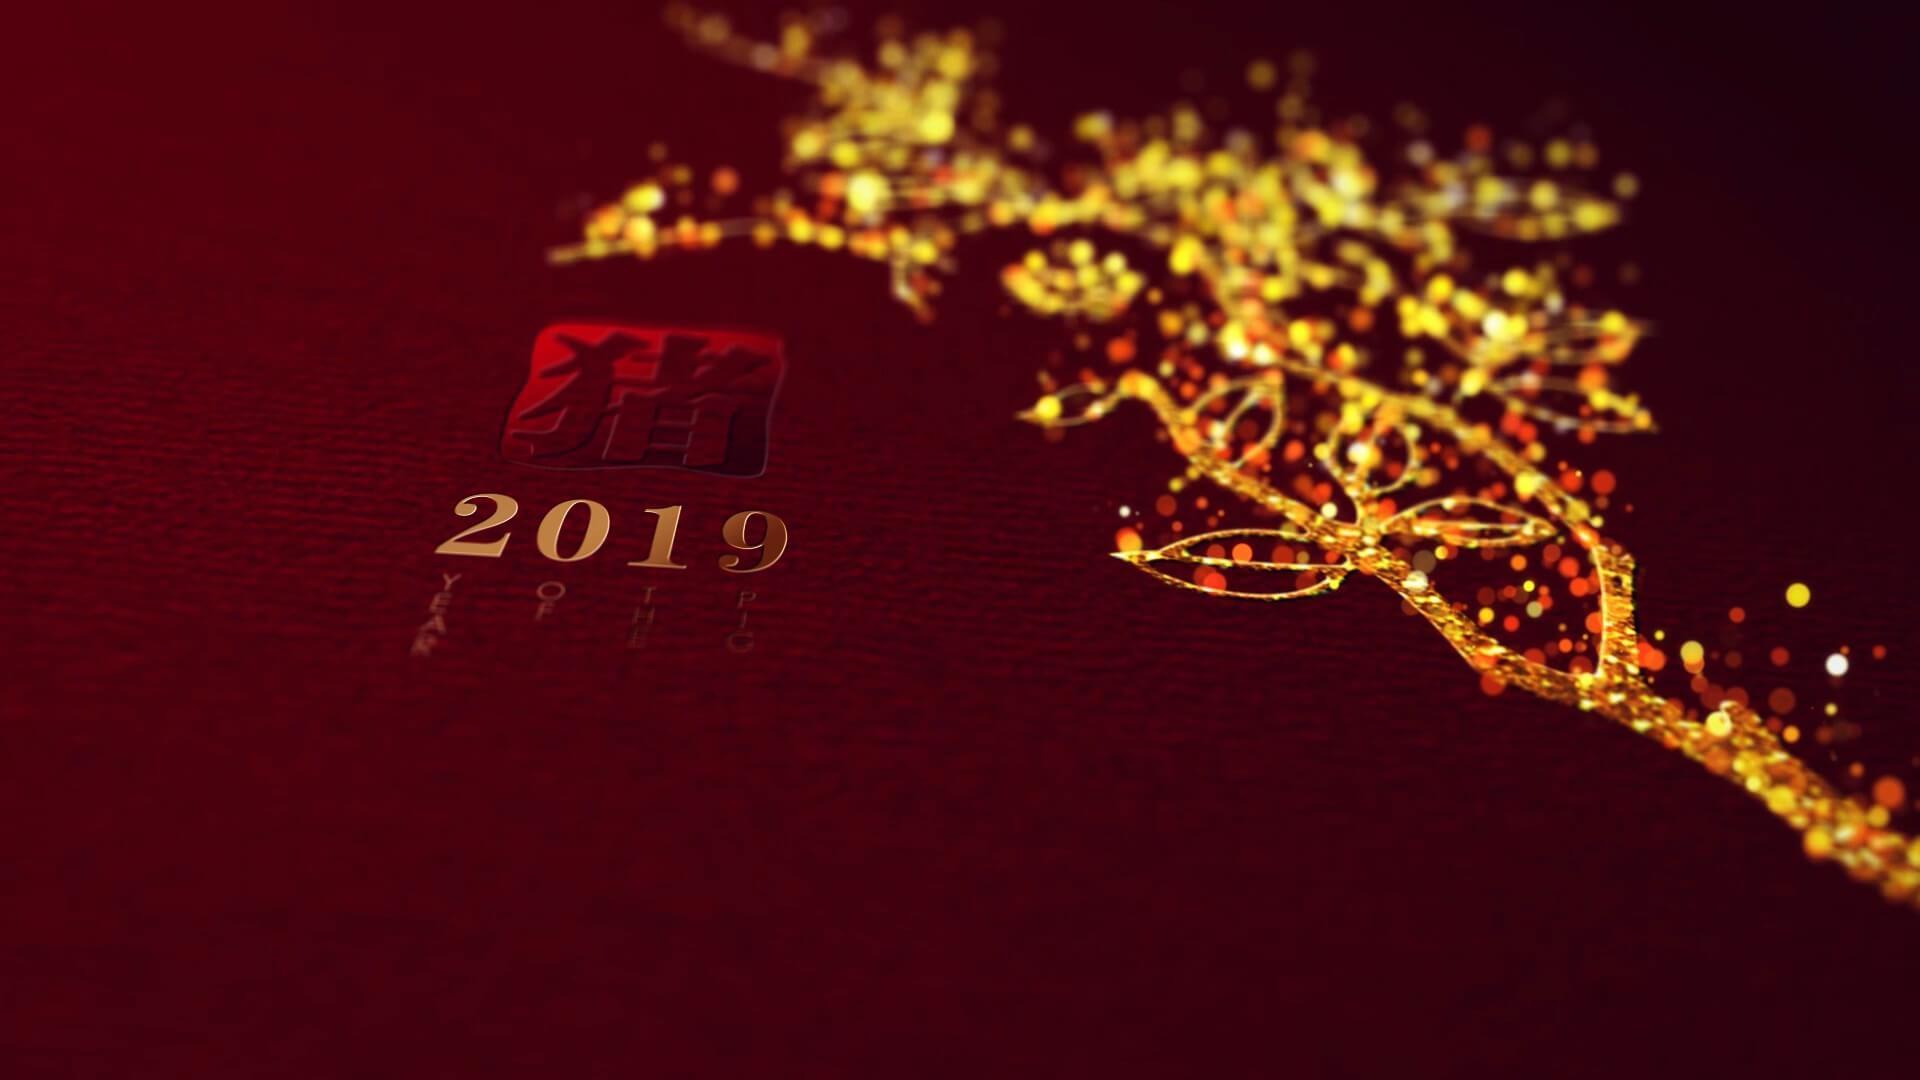 AE模板 喜庆中国风2019猪年新年片头片尾 喜庆金色花纹 春节联欢晚会开场